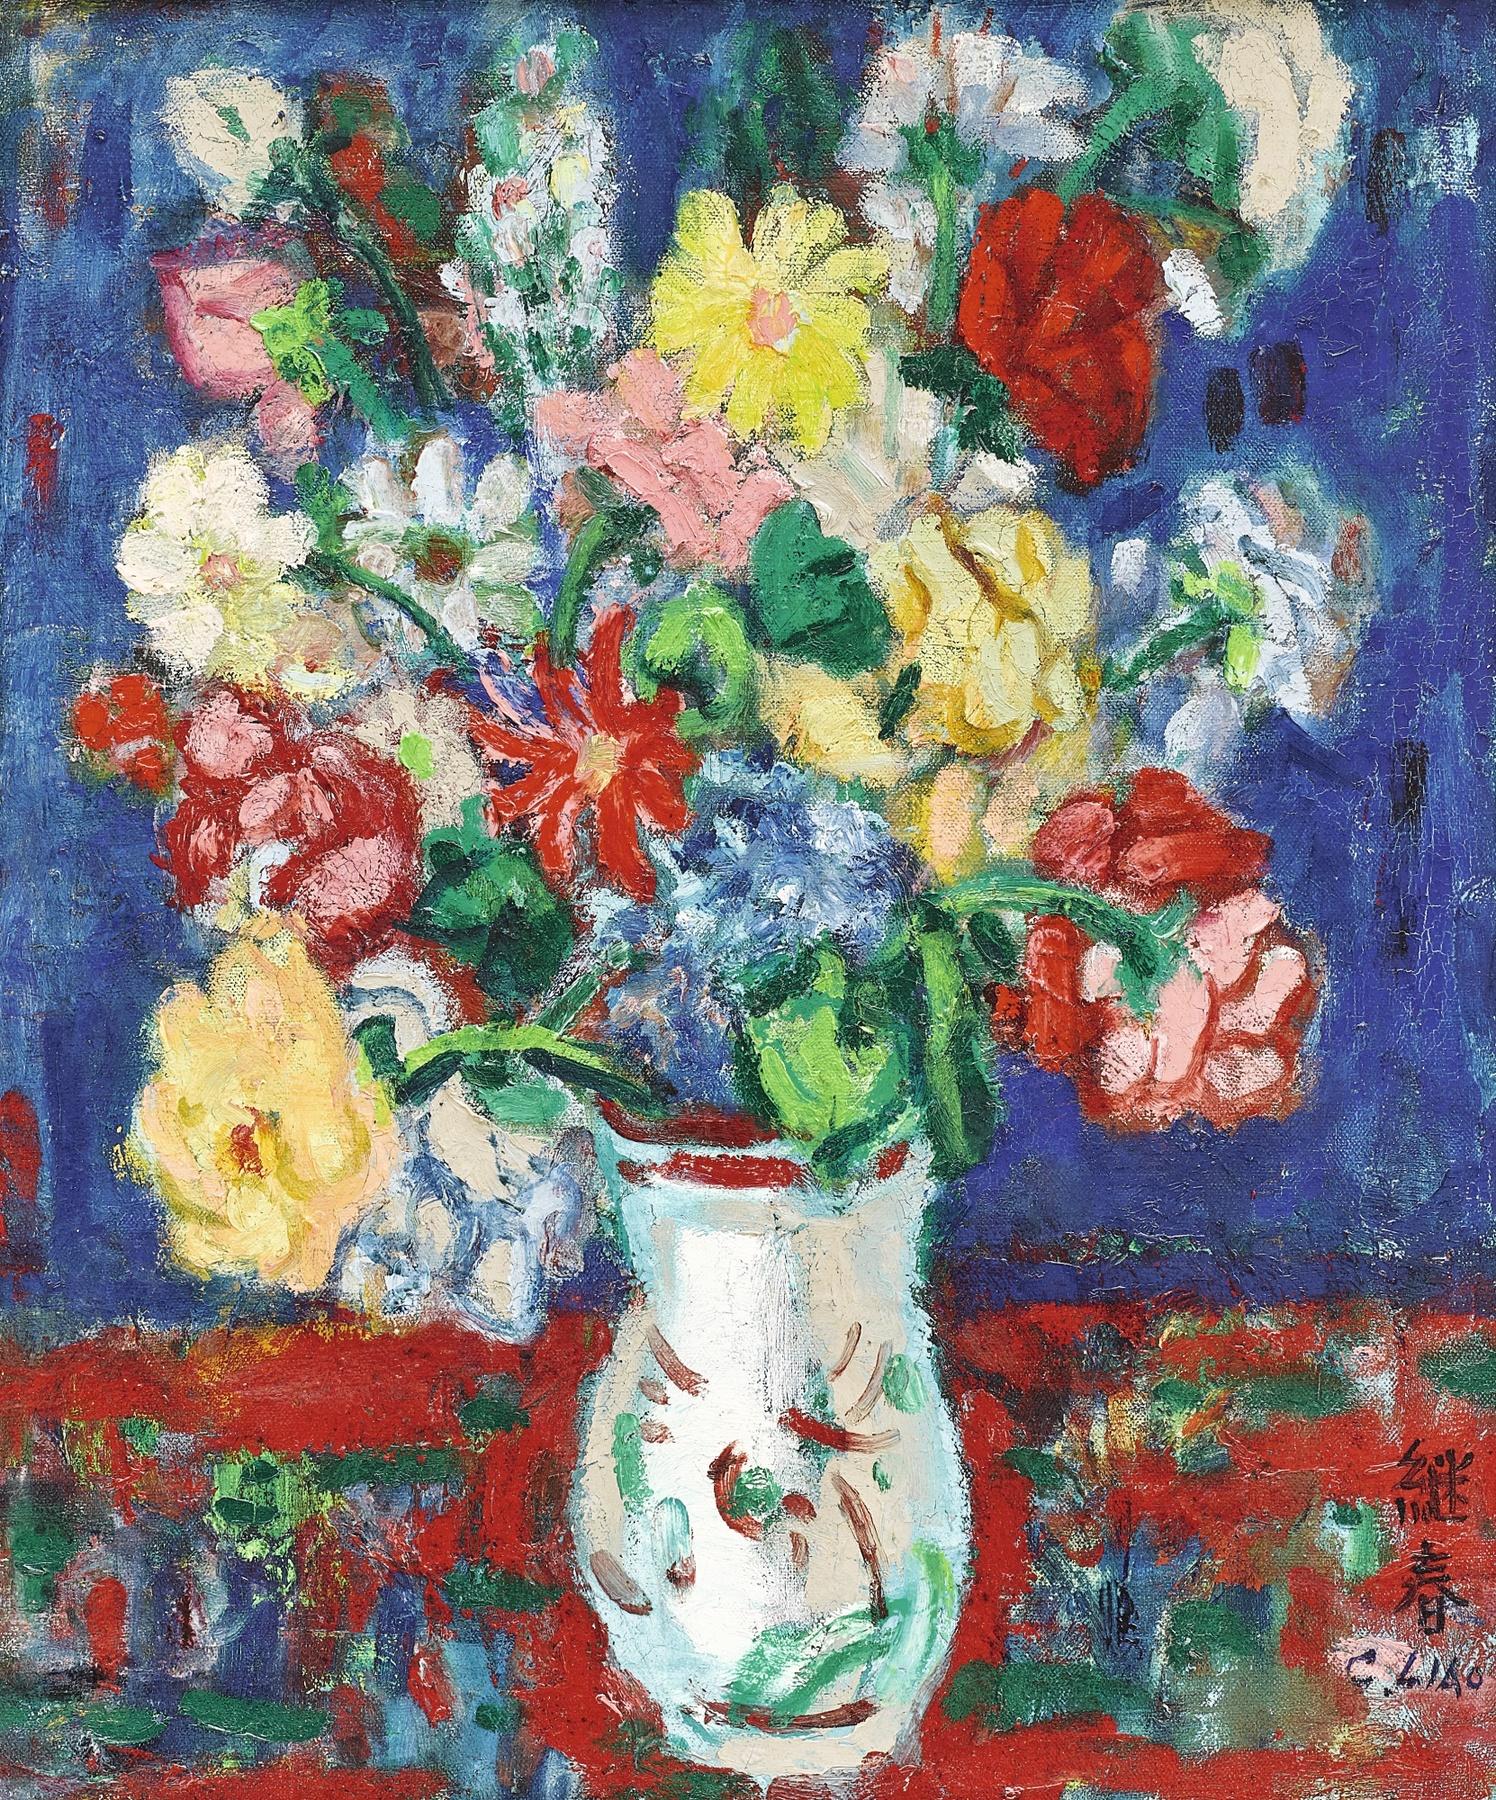 Liao Chi-chun-Flowers-1967